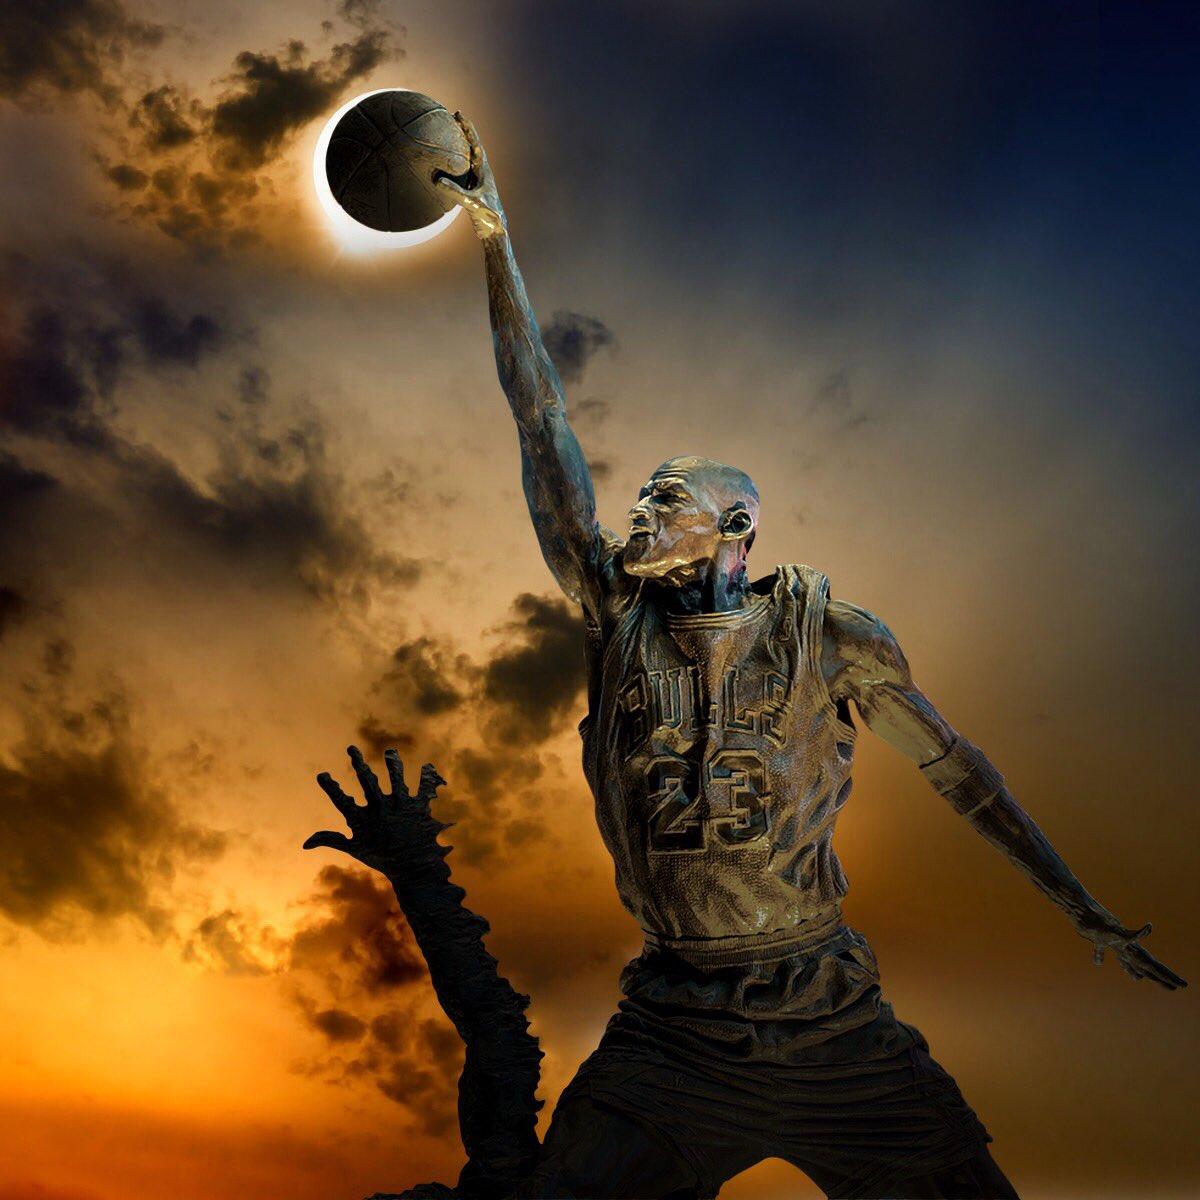 The Greatest (Eclipse) of All Time #SolarEclipse2017 https://t.co/tz8WGikZAu